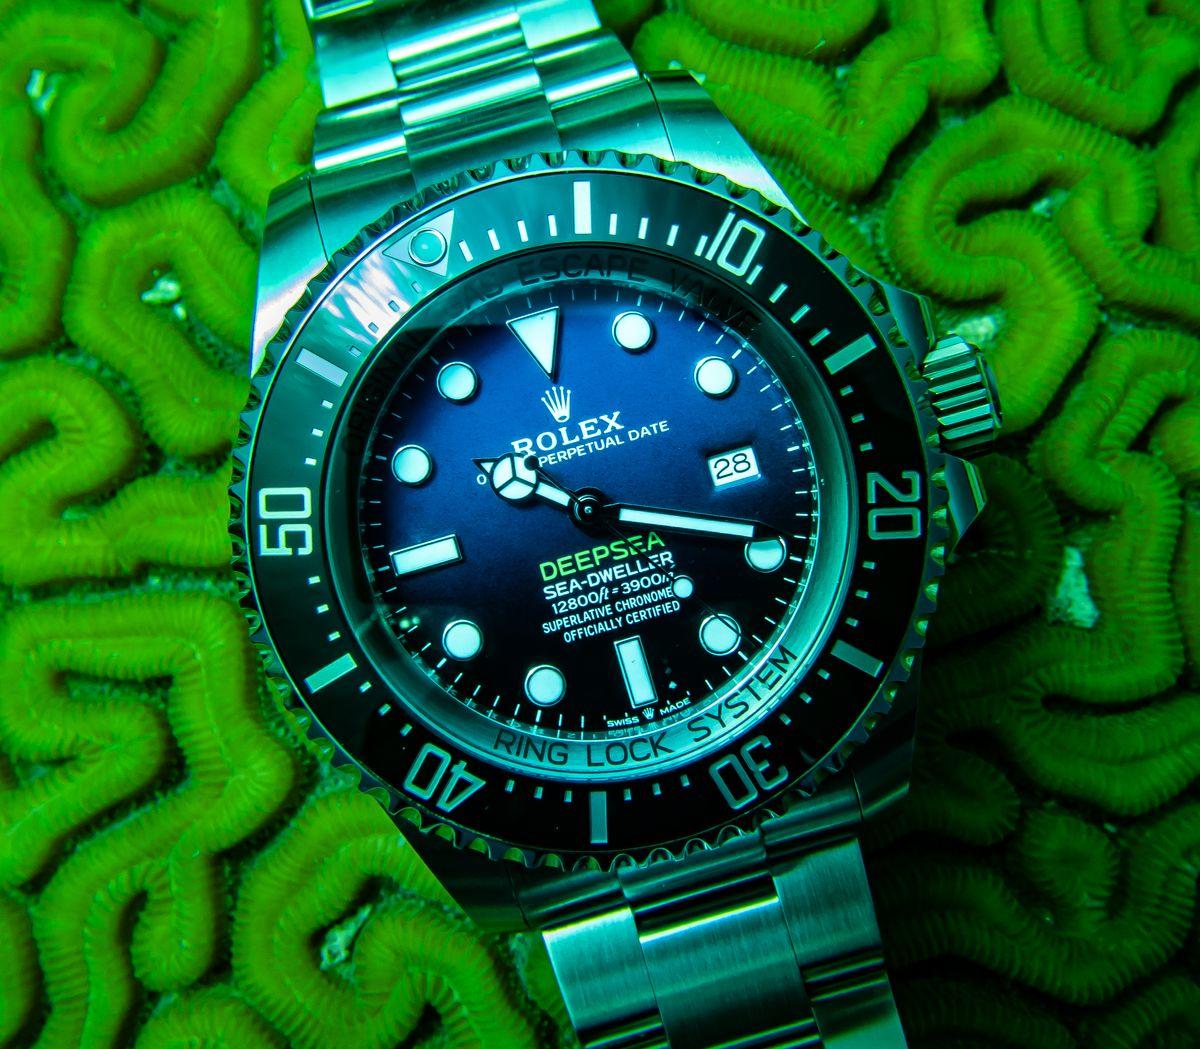 Rolex Sea-Dweller Deepsea SCUBA Diving James Cameron D-Blue Dial